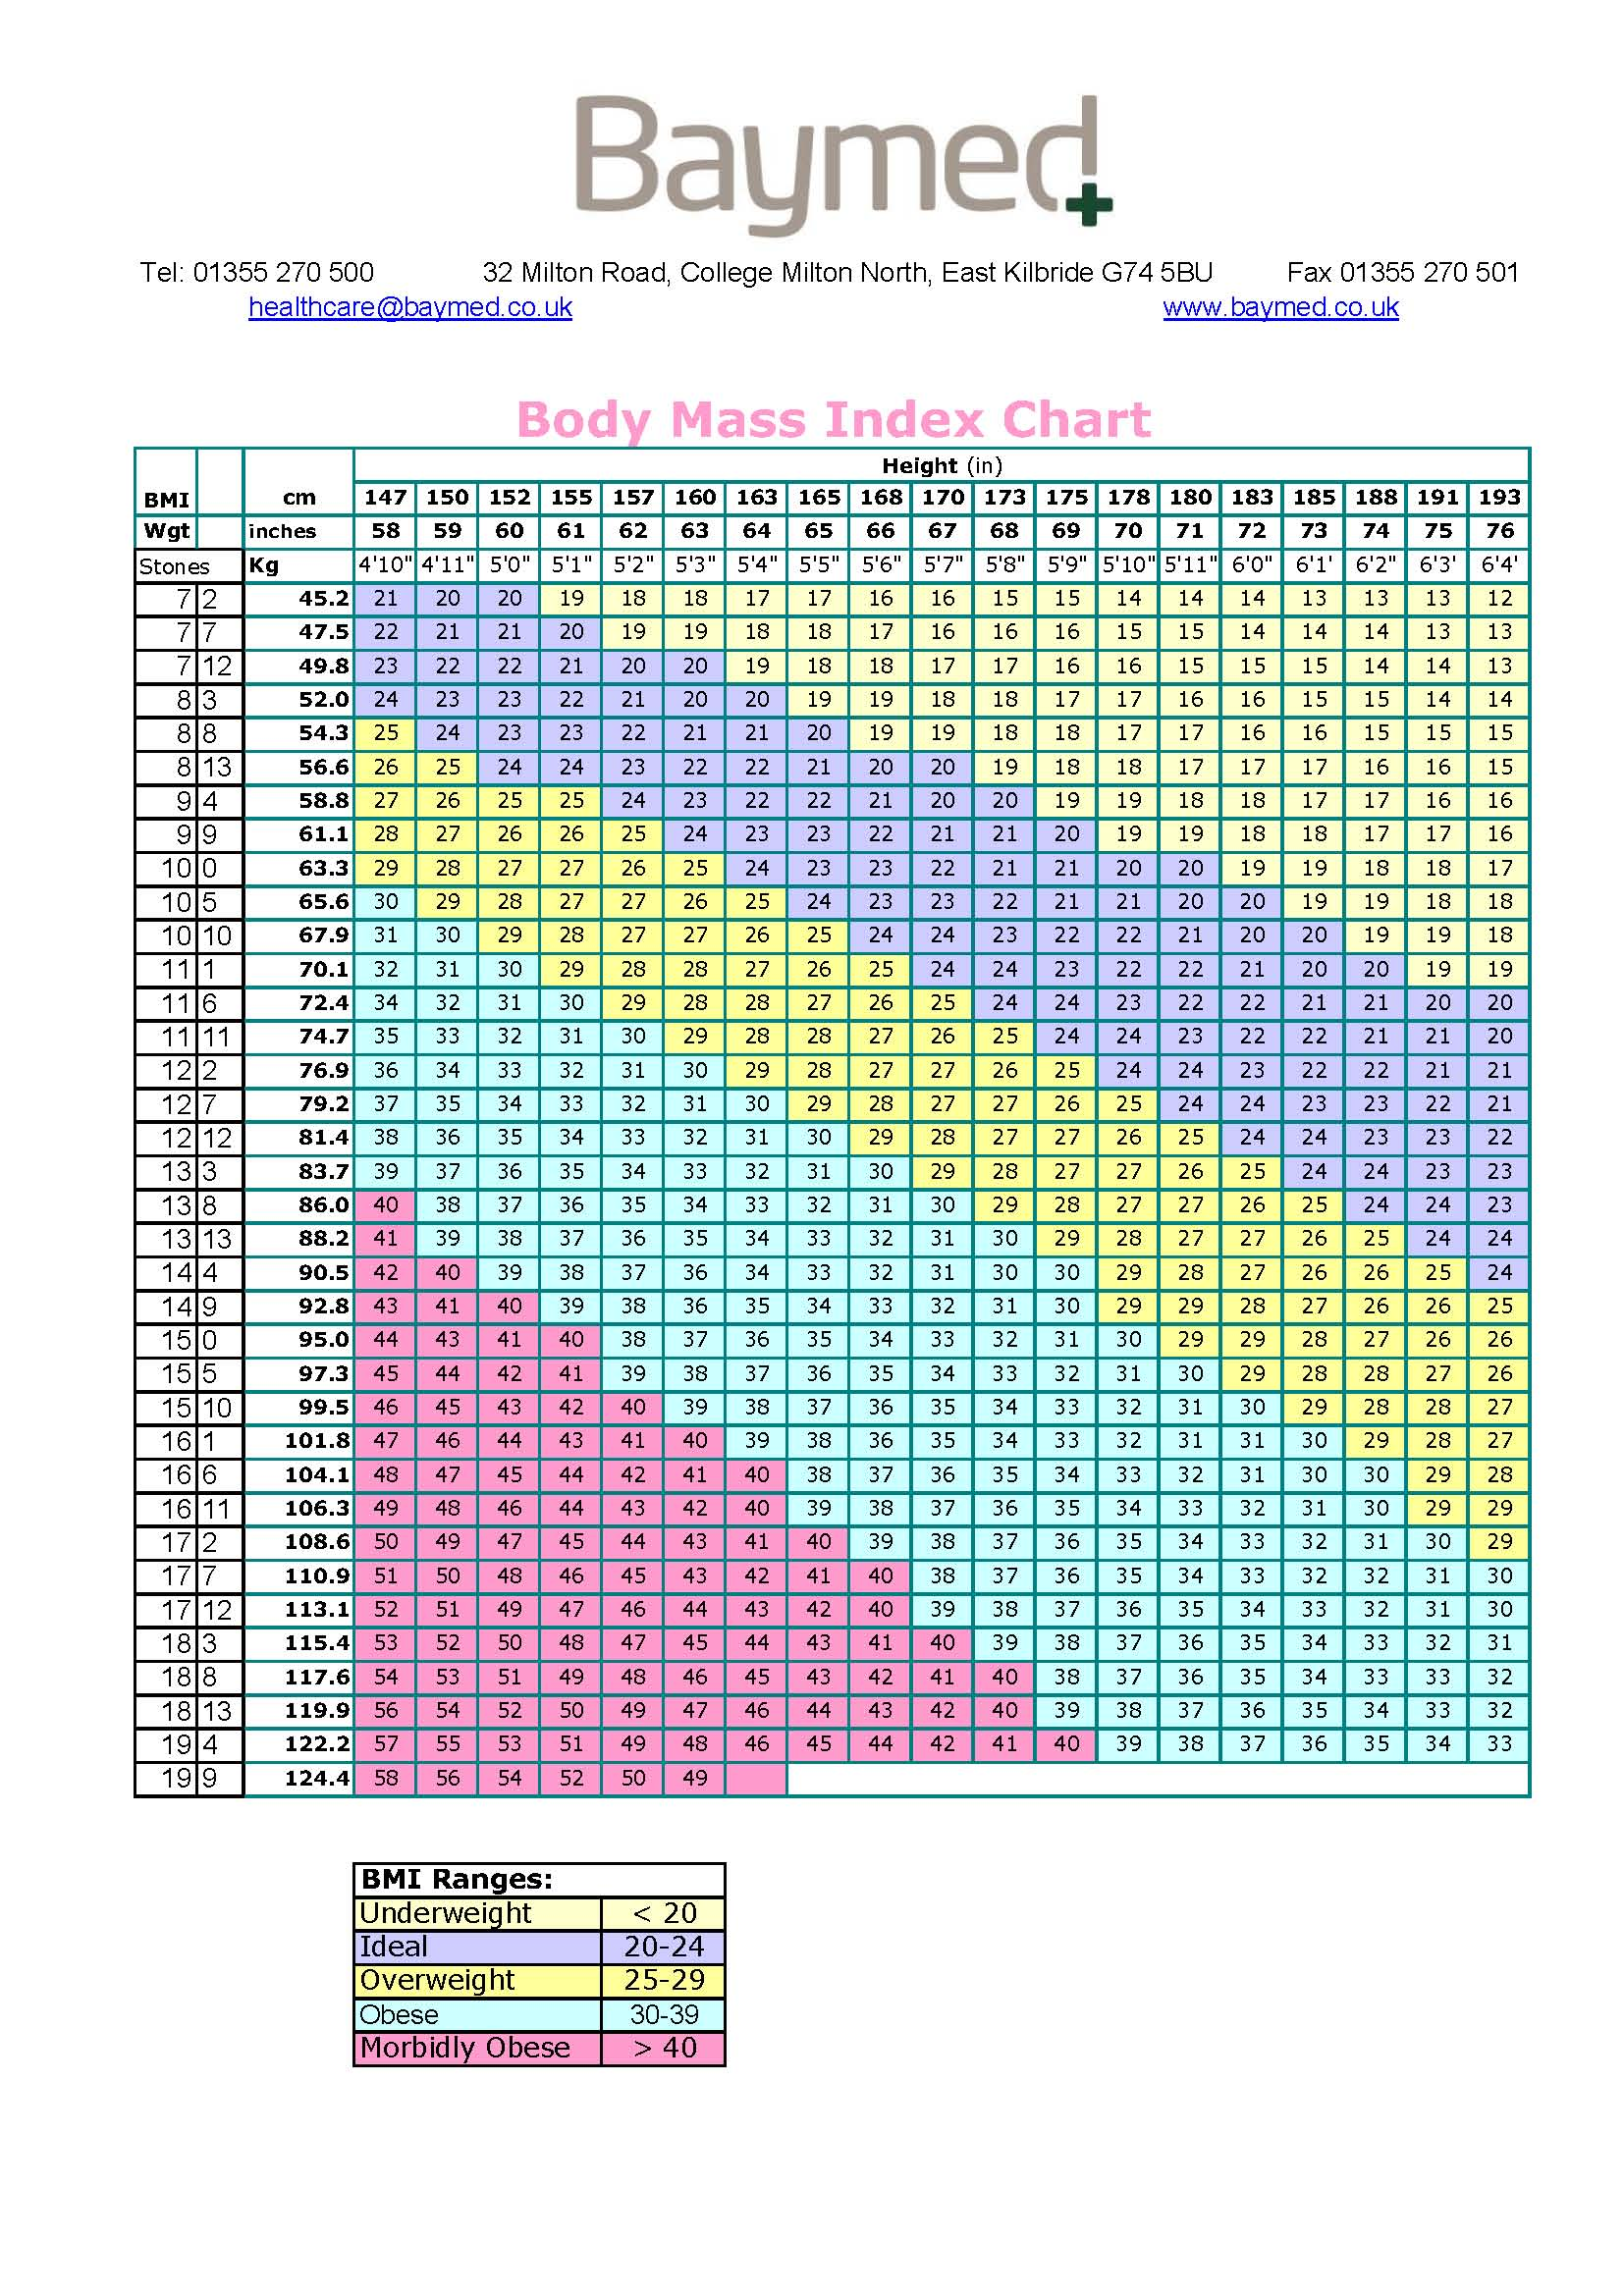 Bmi Chart Laminated A3